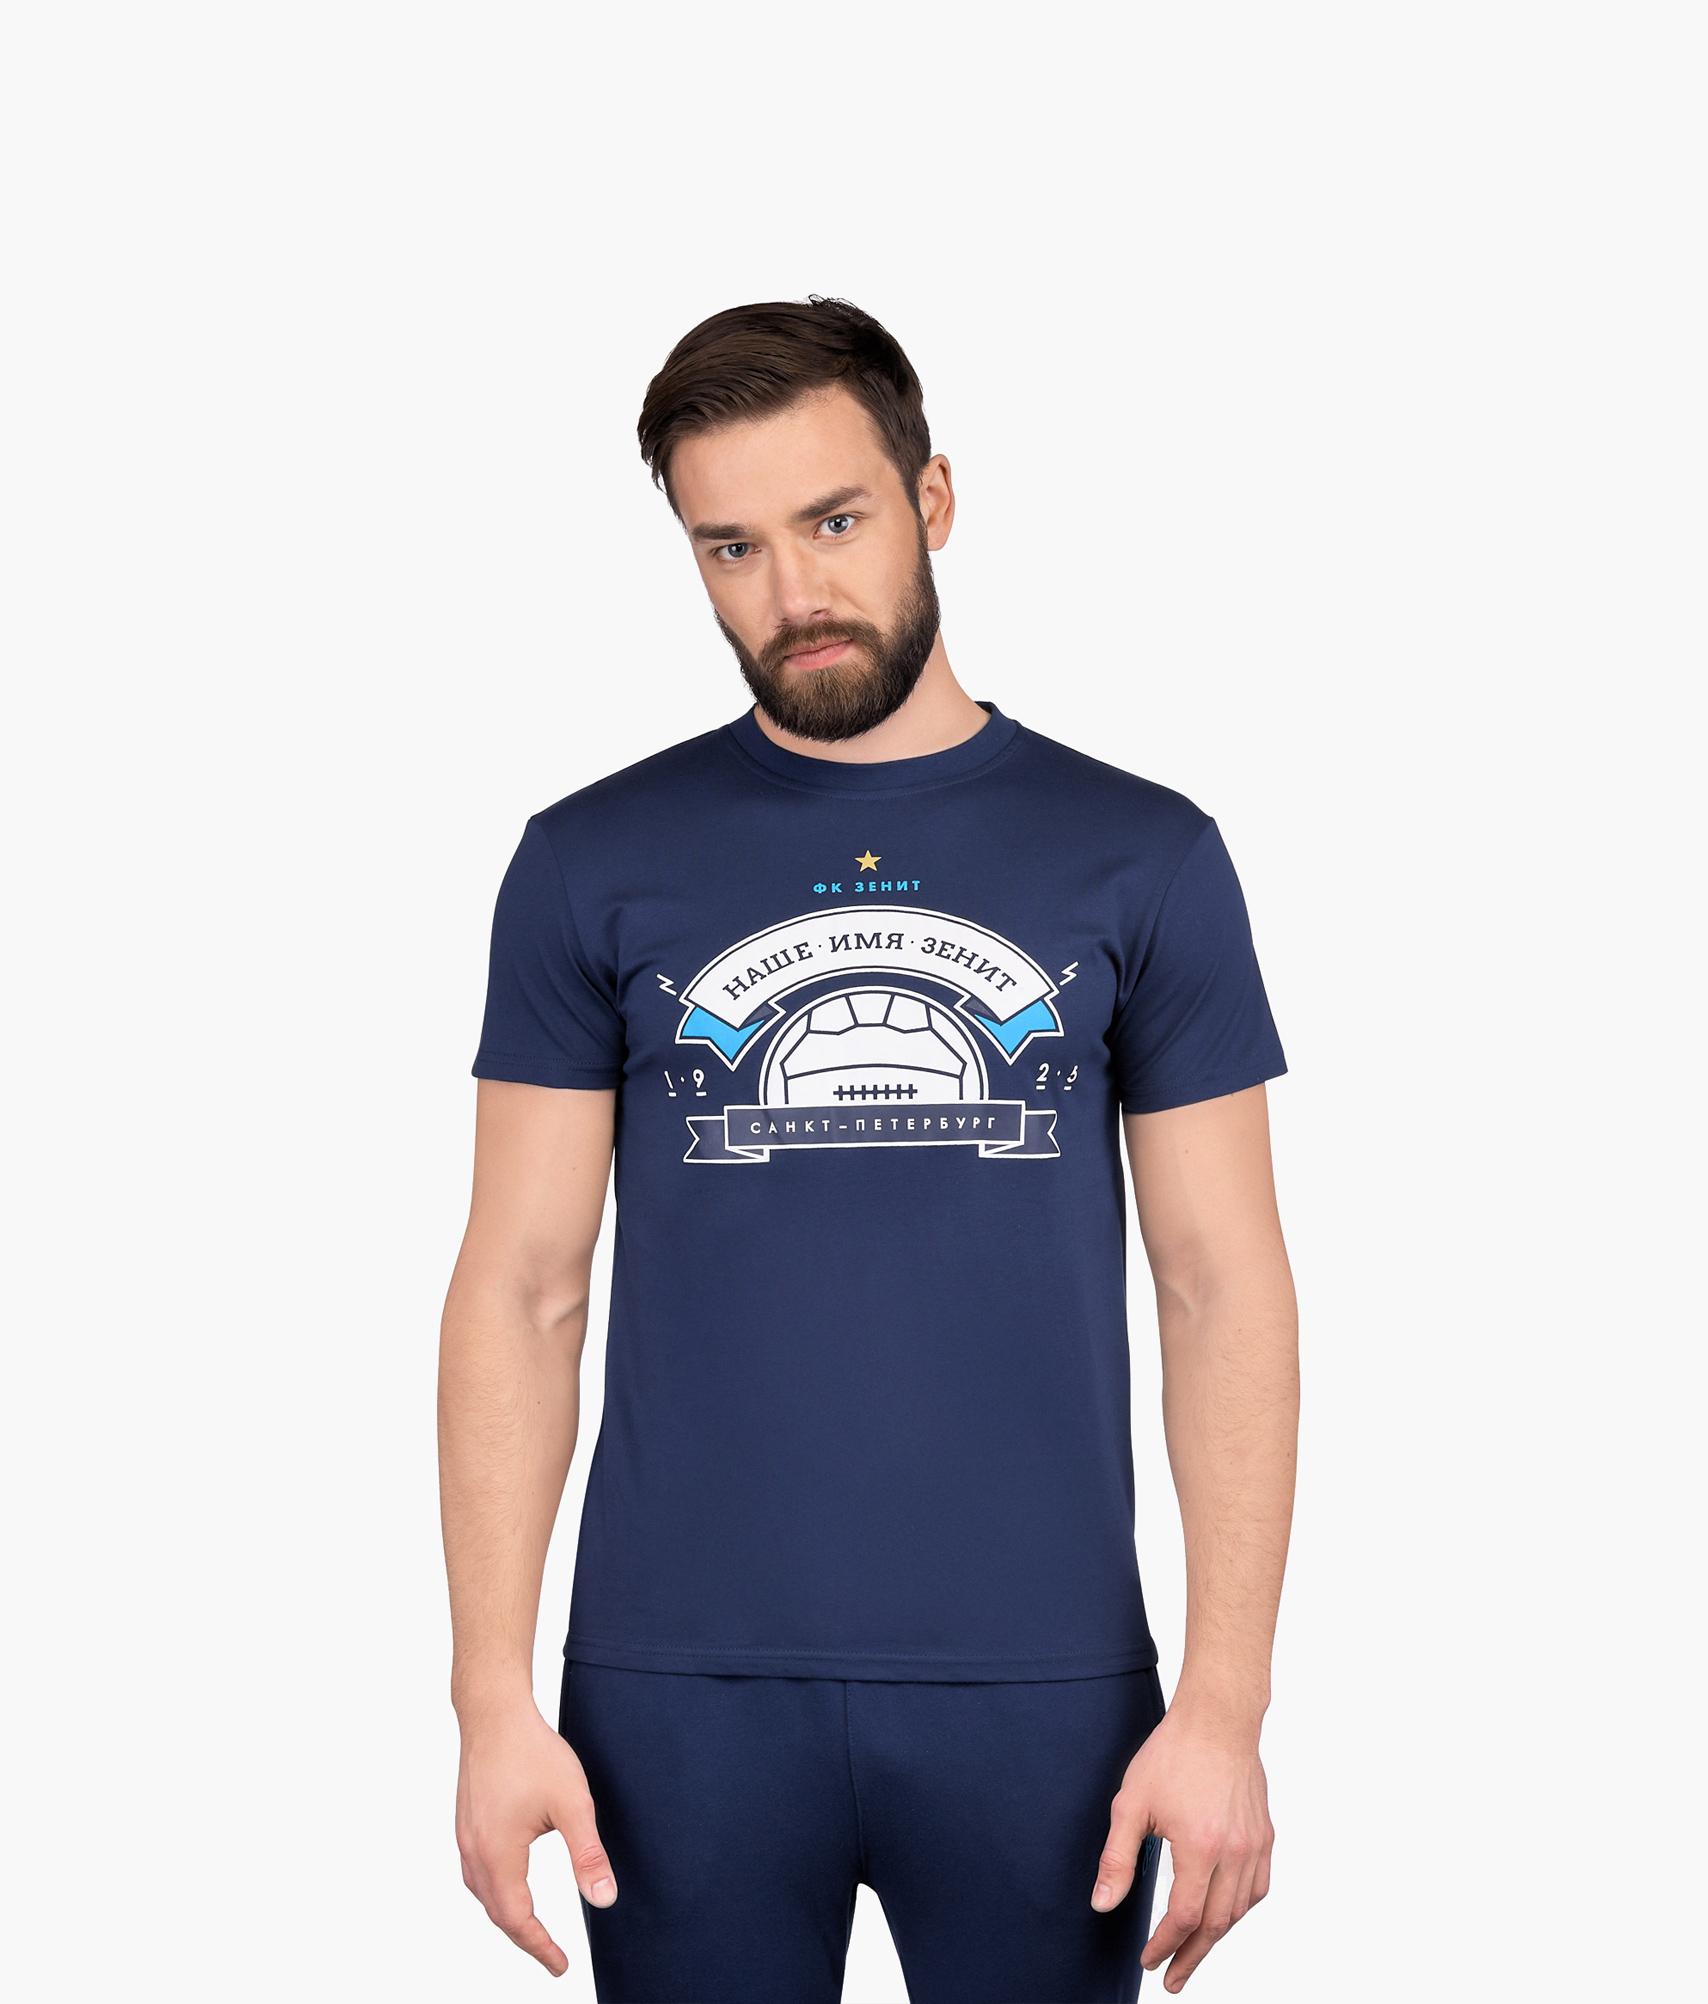 Футболка мужская «Наше имя Зенит» Зенит Цвет-Синий футболка зенит со своей фамилией